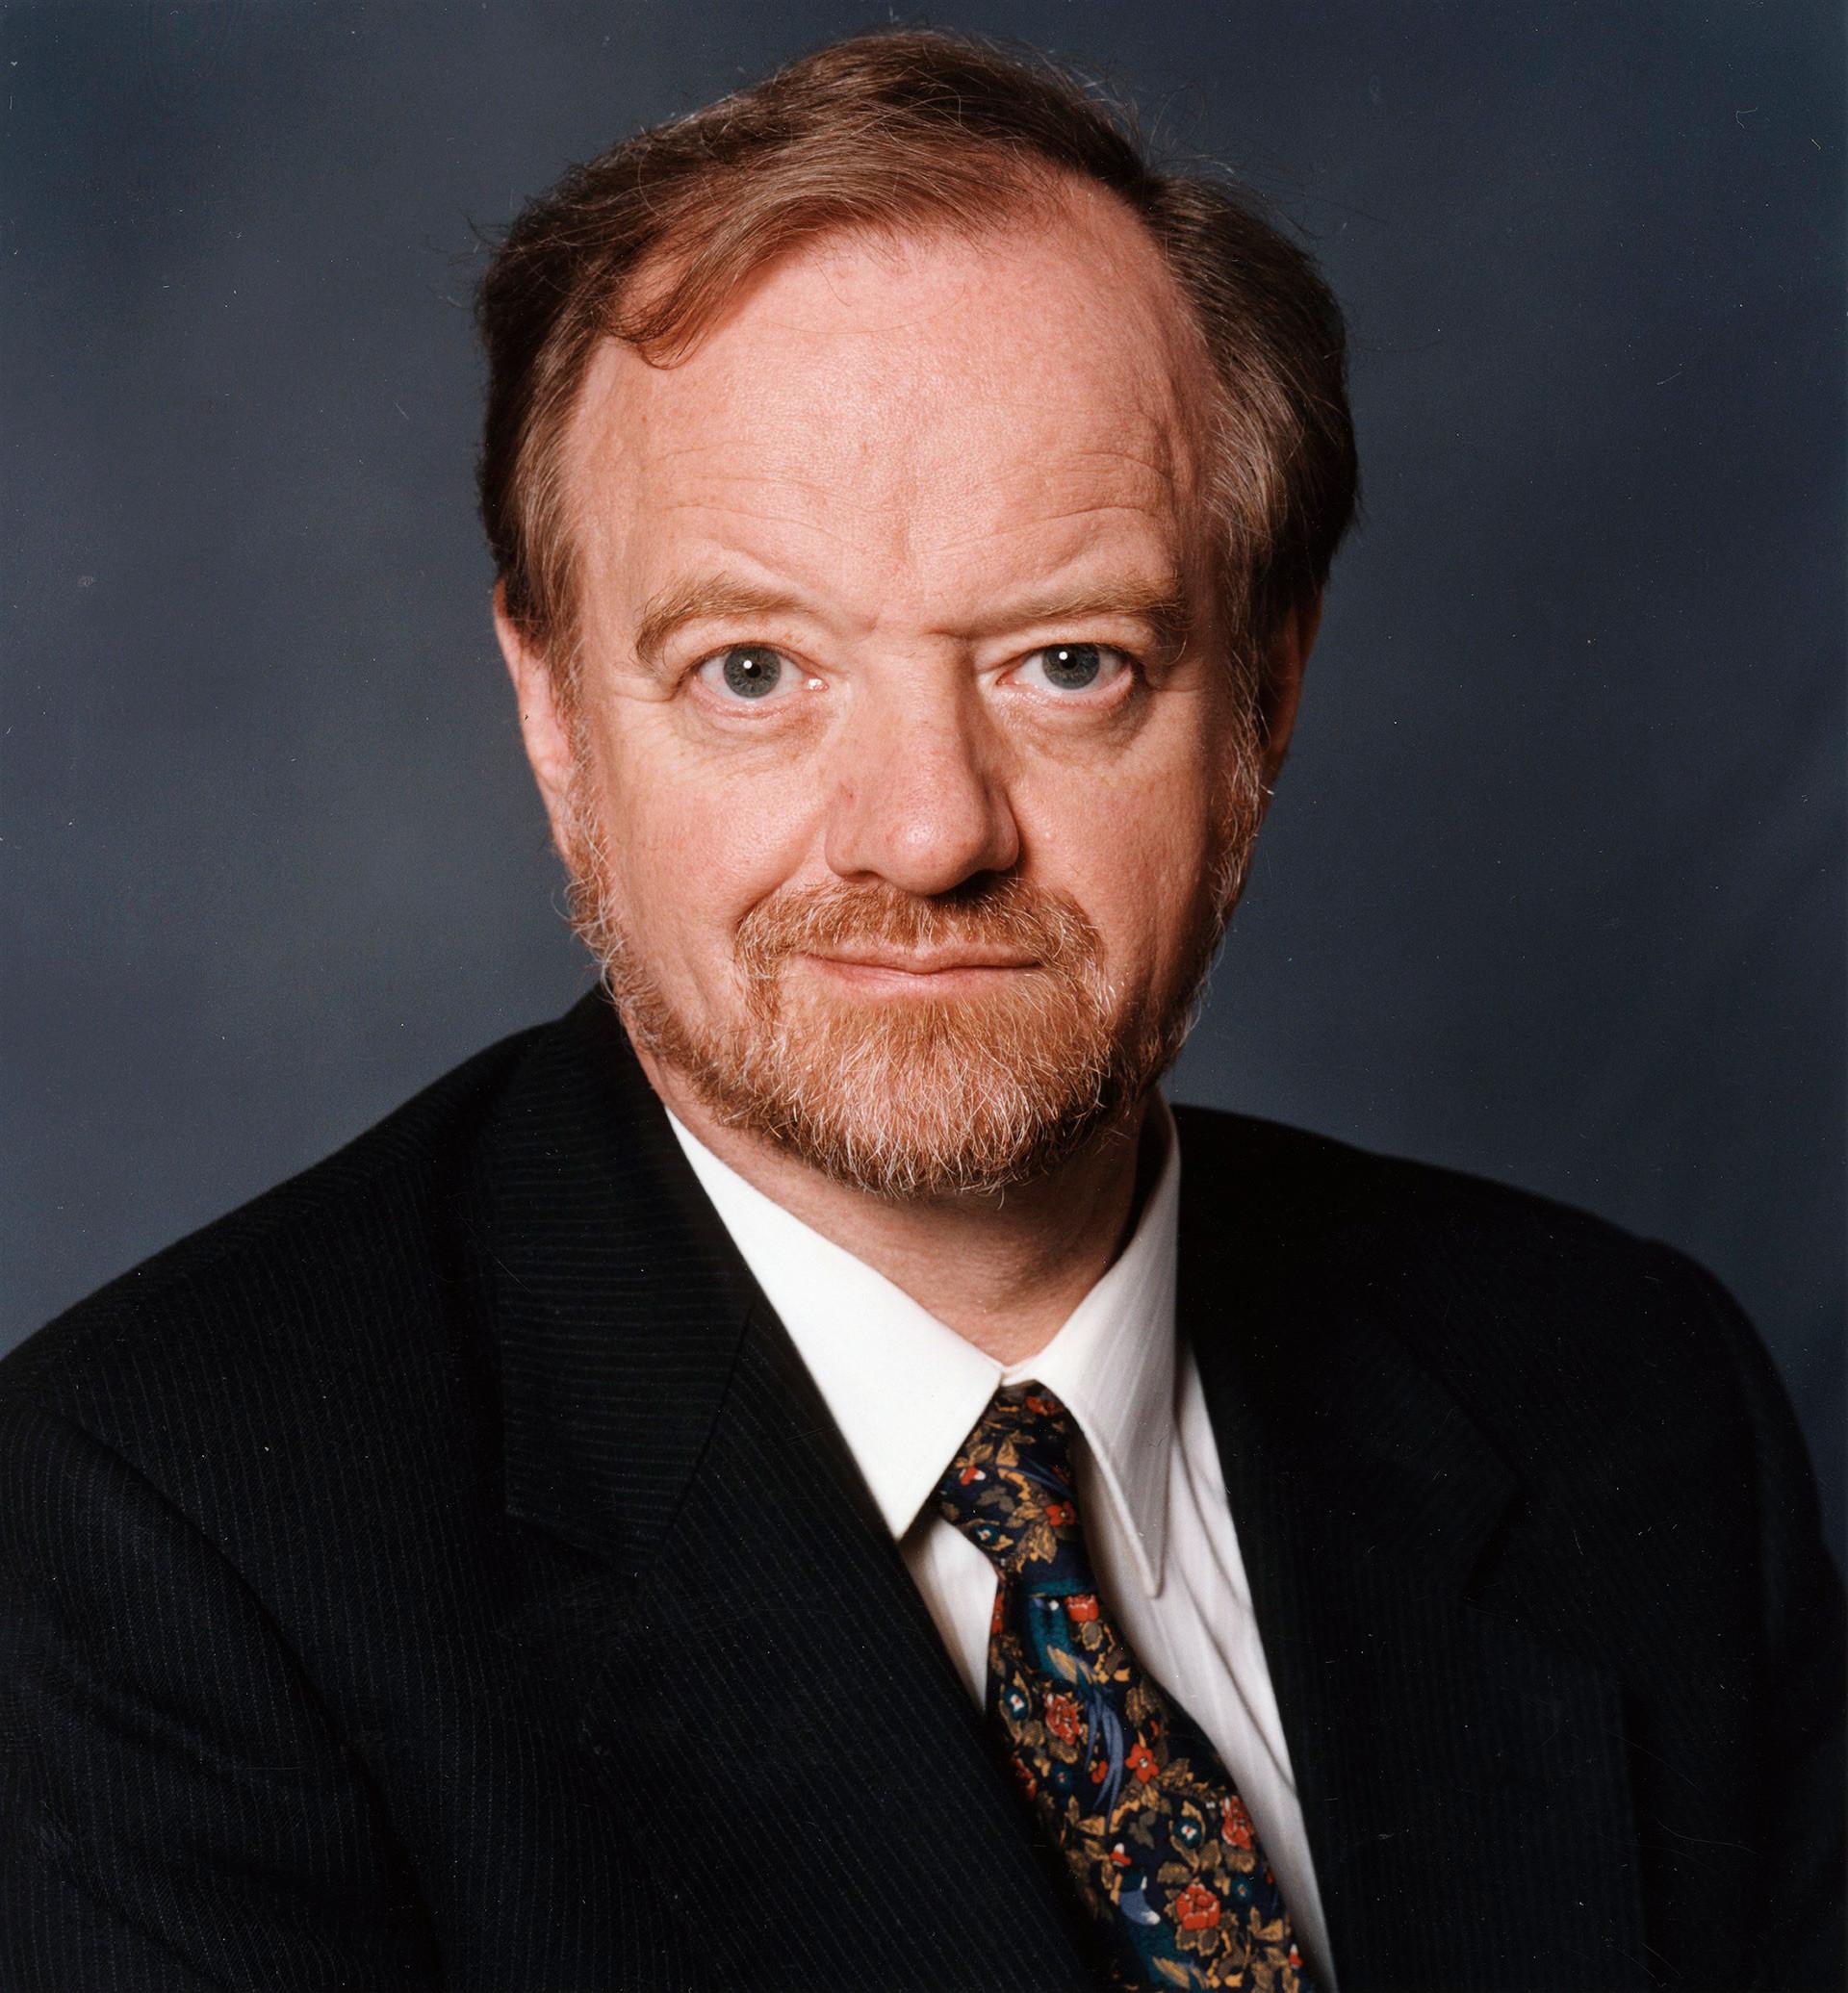 Robin Cook (1946. - 2005.), političar britanske Laburističke stranke, ministar vanjskih poslova (1997. - 2001.).